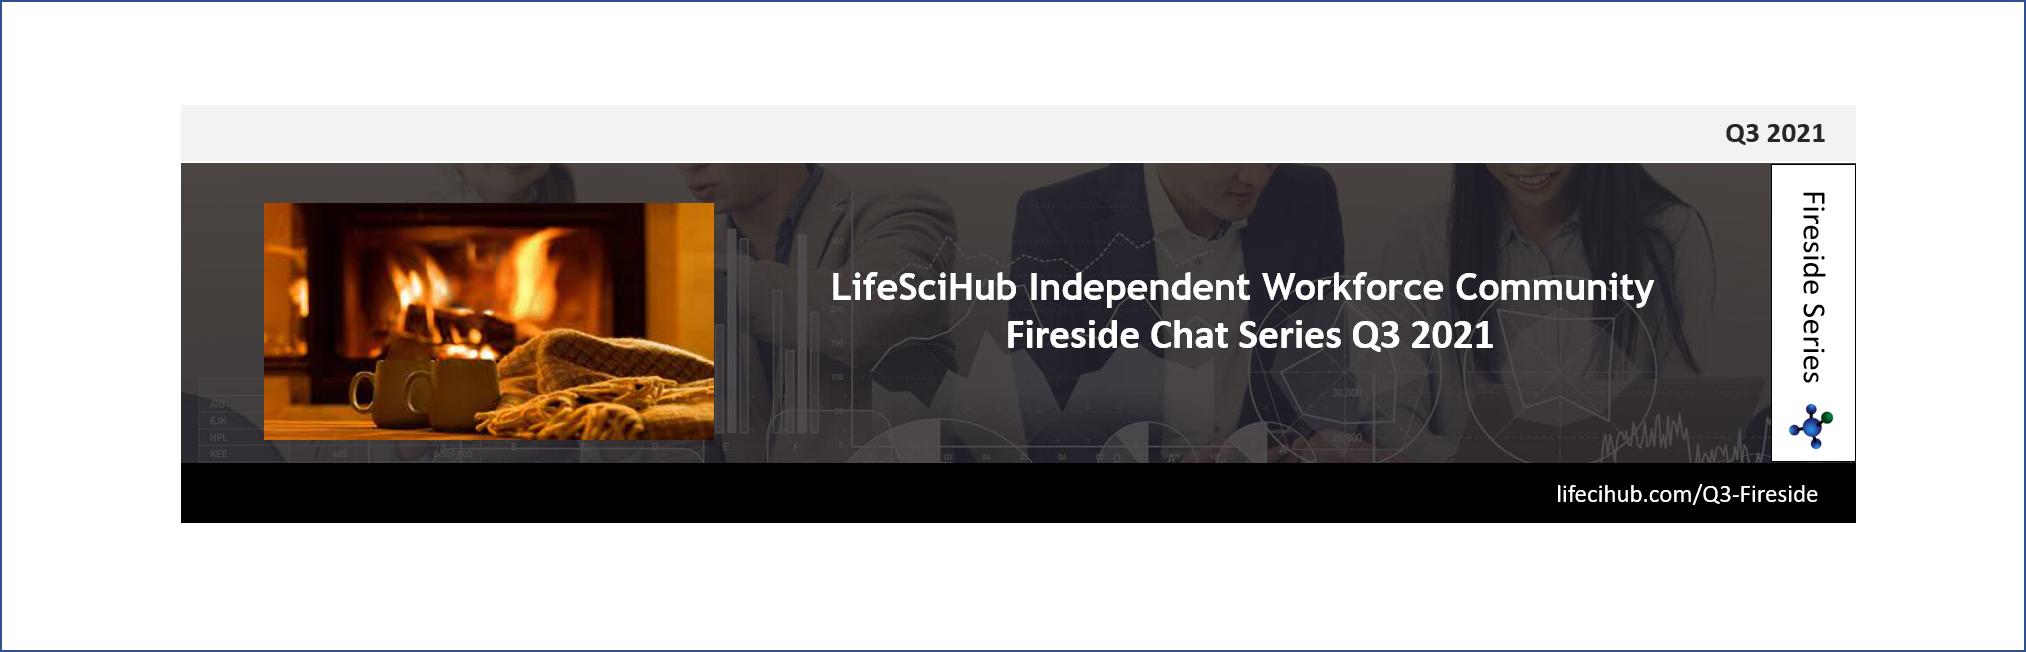 LifeSciHub Q3 2021 Fireside Chat Series